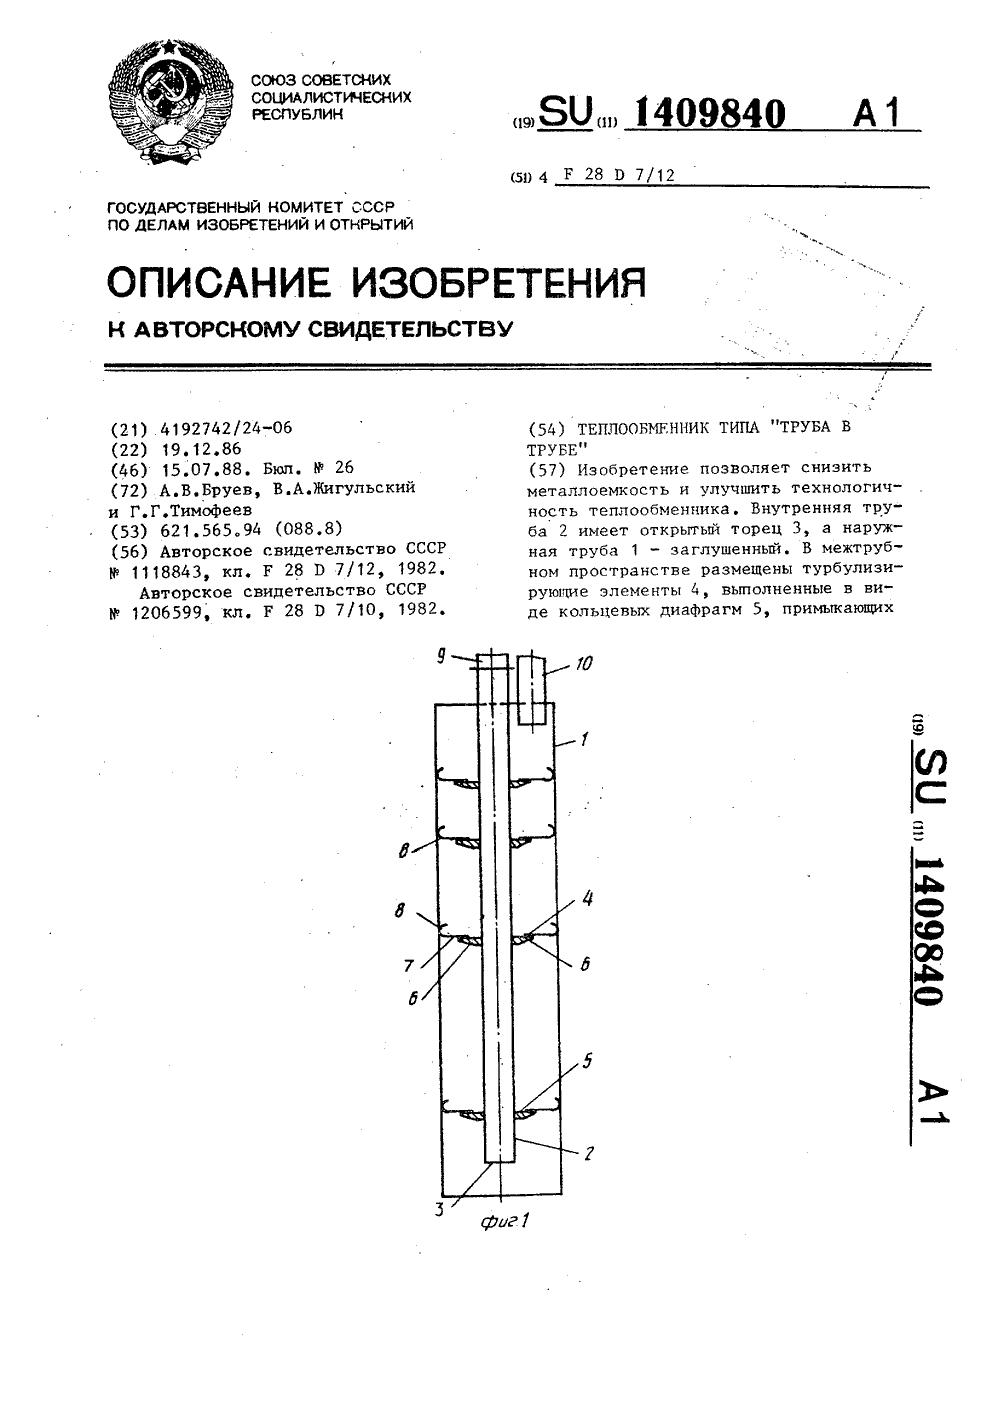 Кожухотрубный теплообменник Alfa Laval Pharma-line 2 - 5.5 Ростов-на-Дону